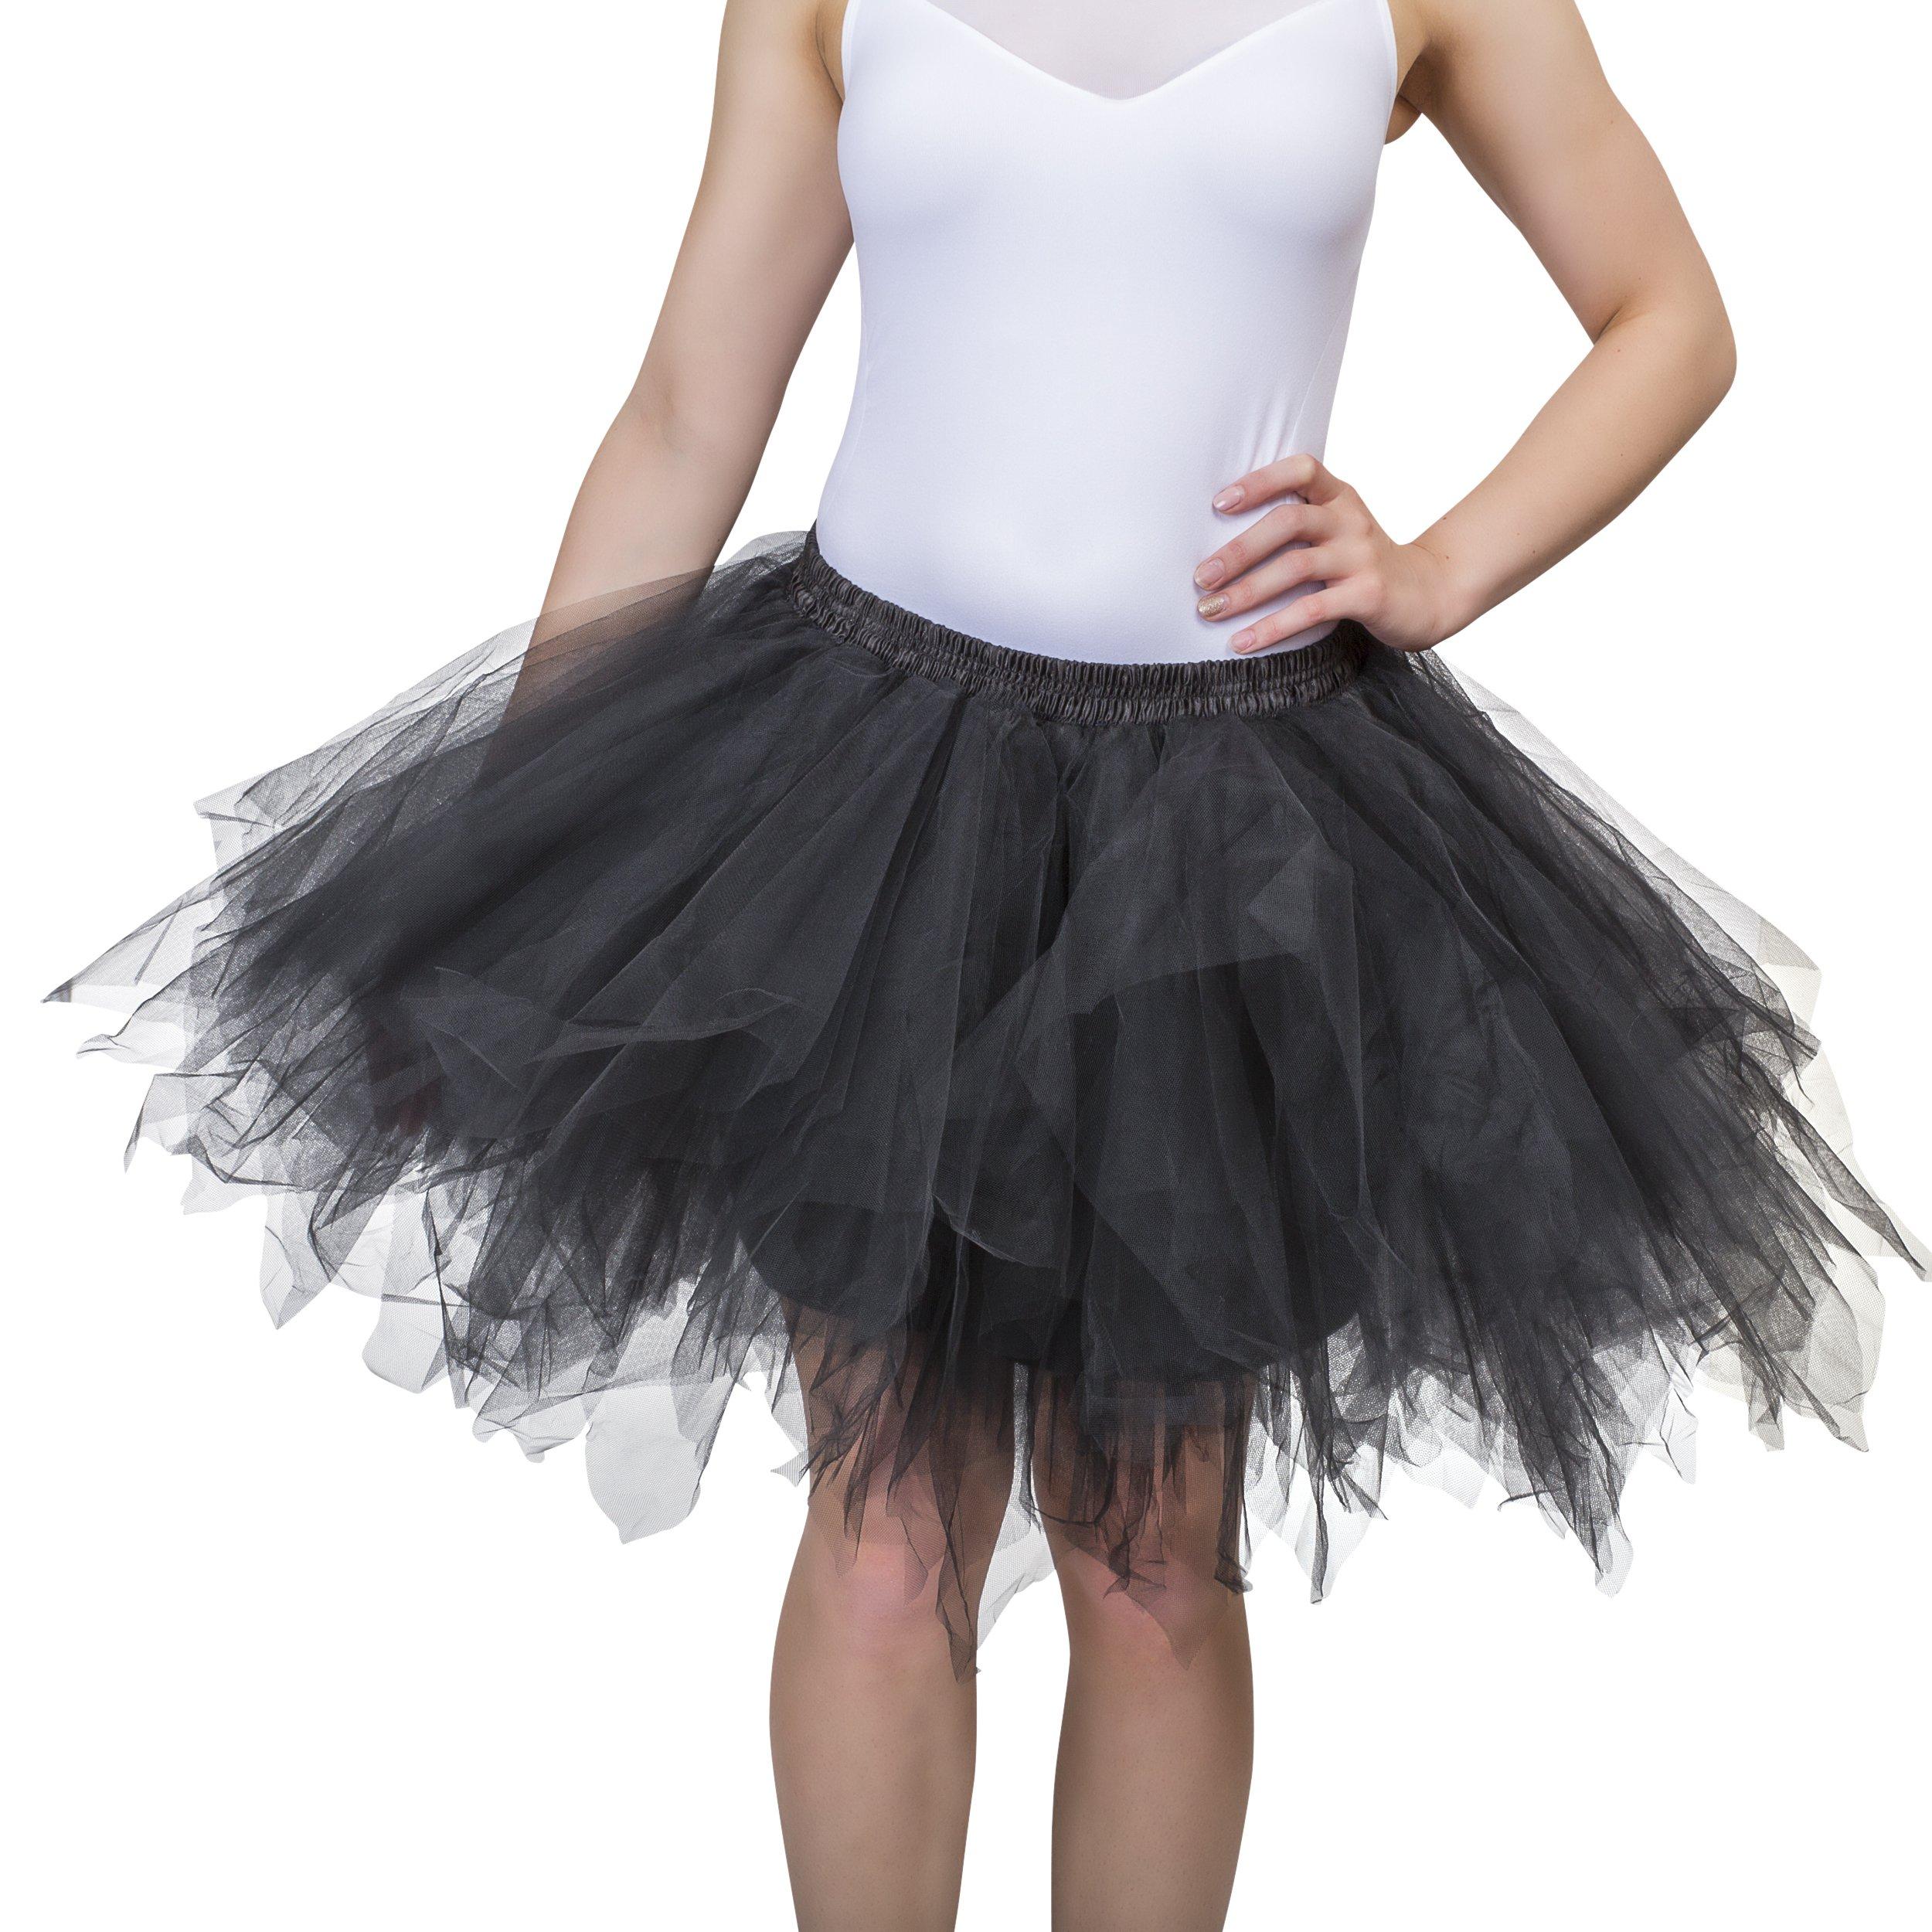 Dancina Women's Adult Vintage Petticoat Tulle Tutu Skirt [Sticker XXL],Black,Plus Size